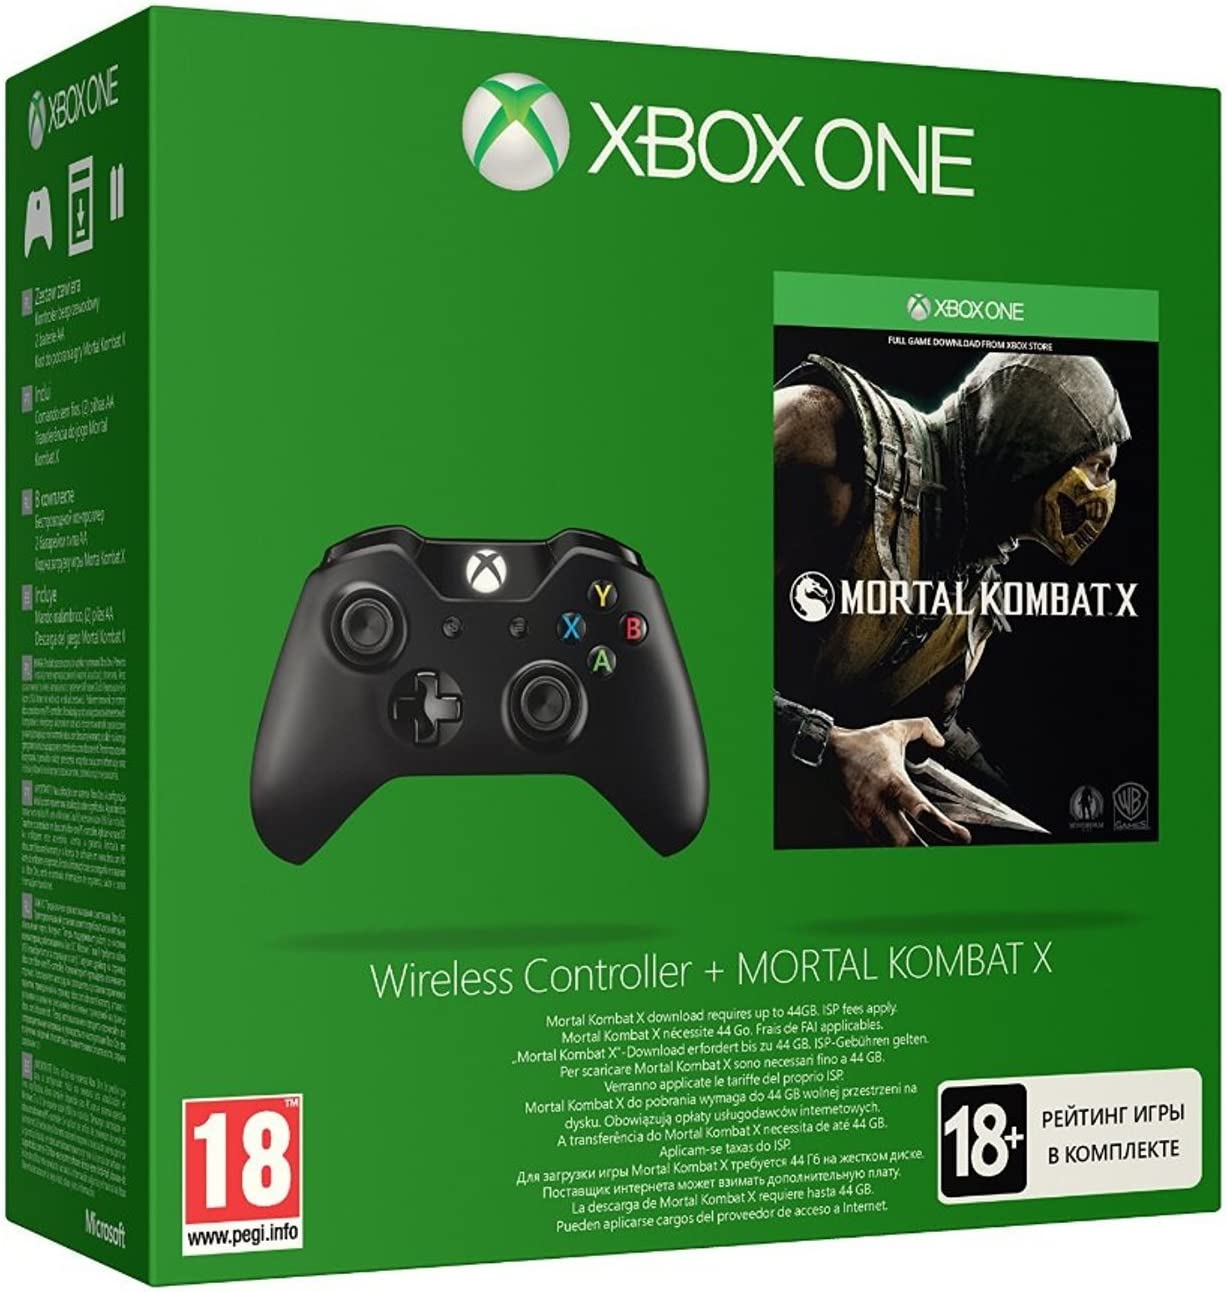 Mortal Kombat X + Mando Wireless: Amazon.es: Videojuegos